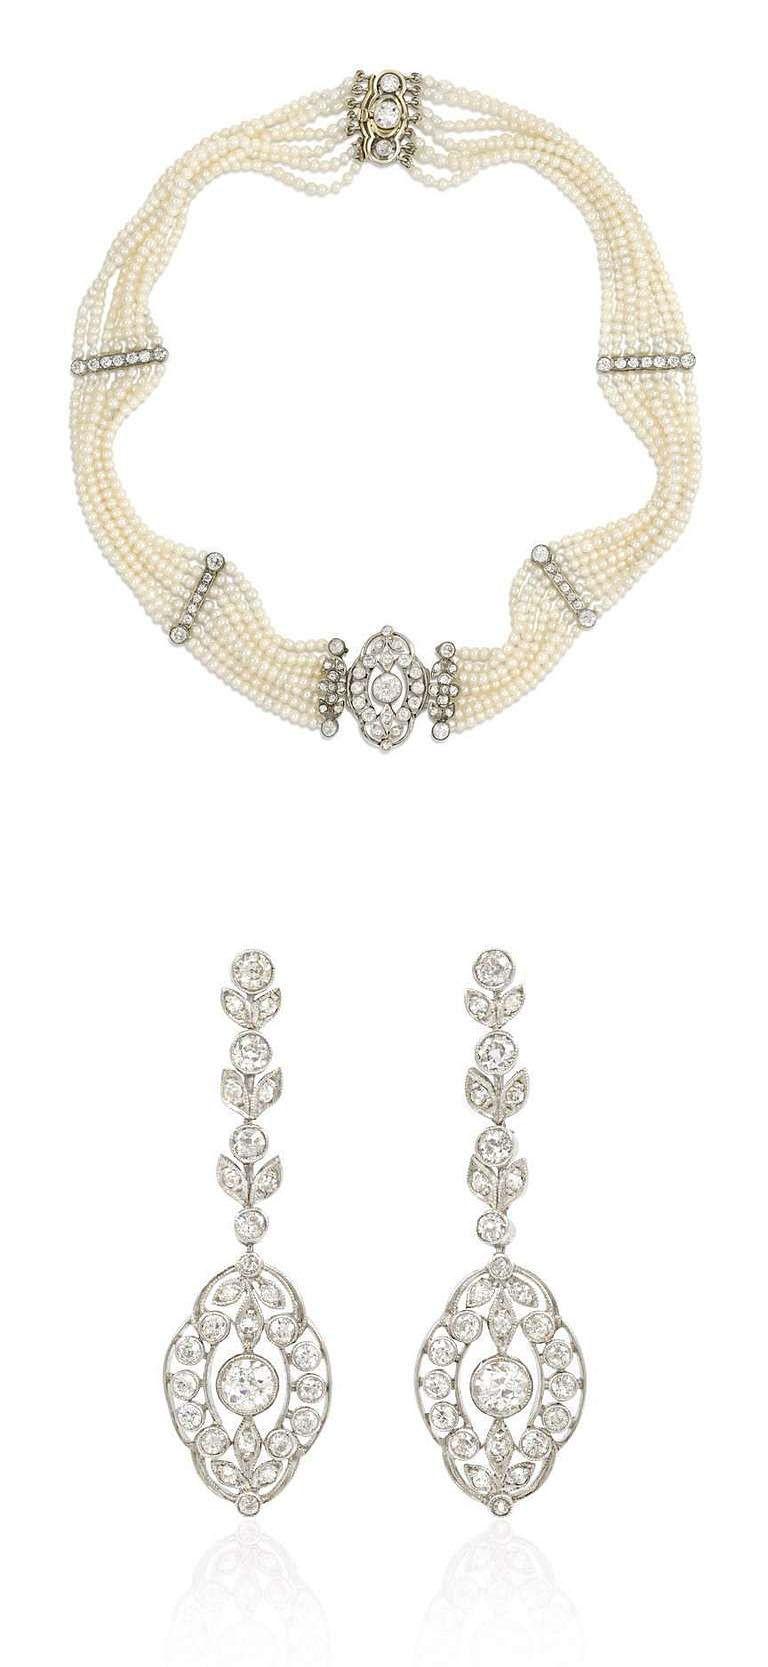 Edwardian Seed Pearl and Diamond Choker with Earrings En Suite. An Edwardian…